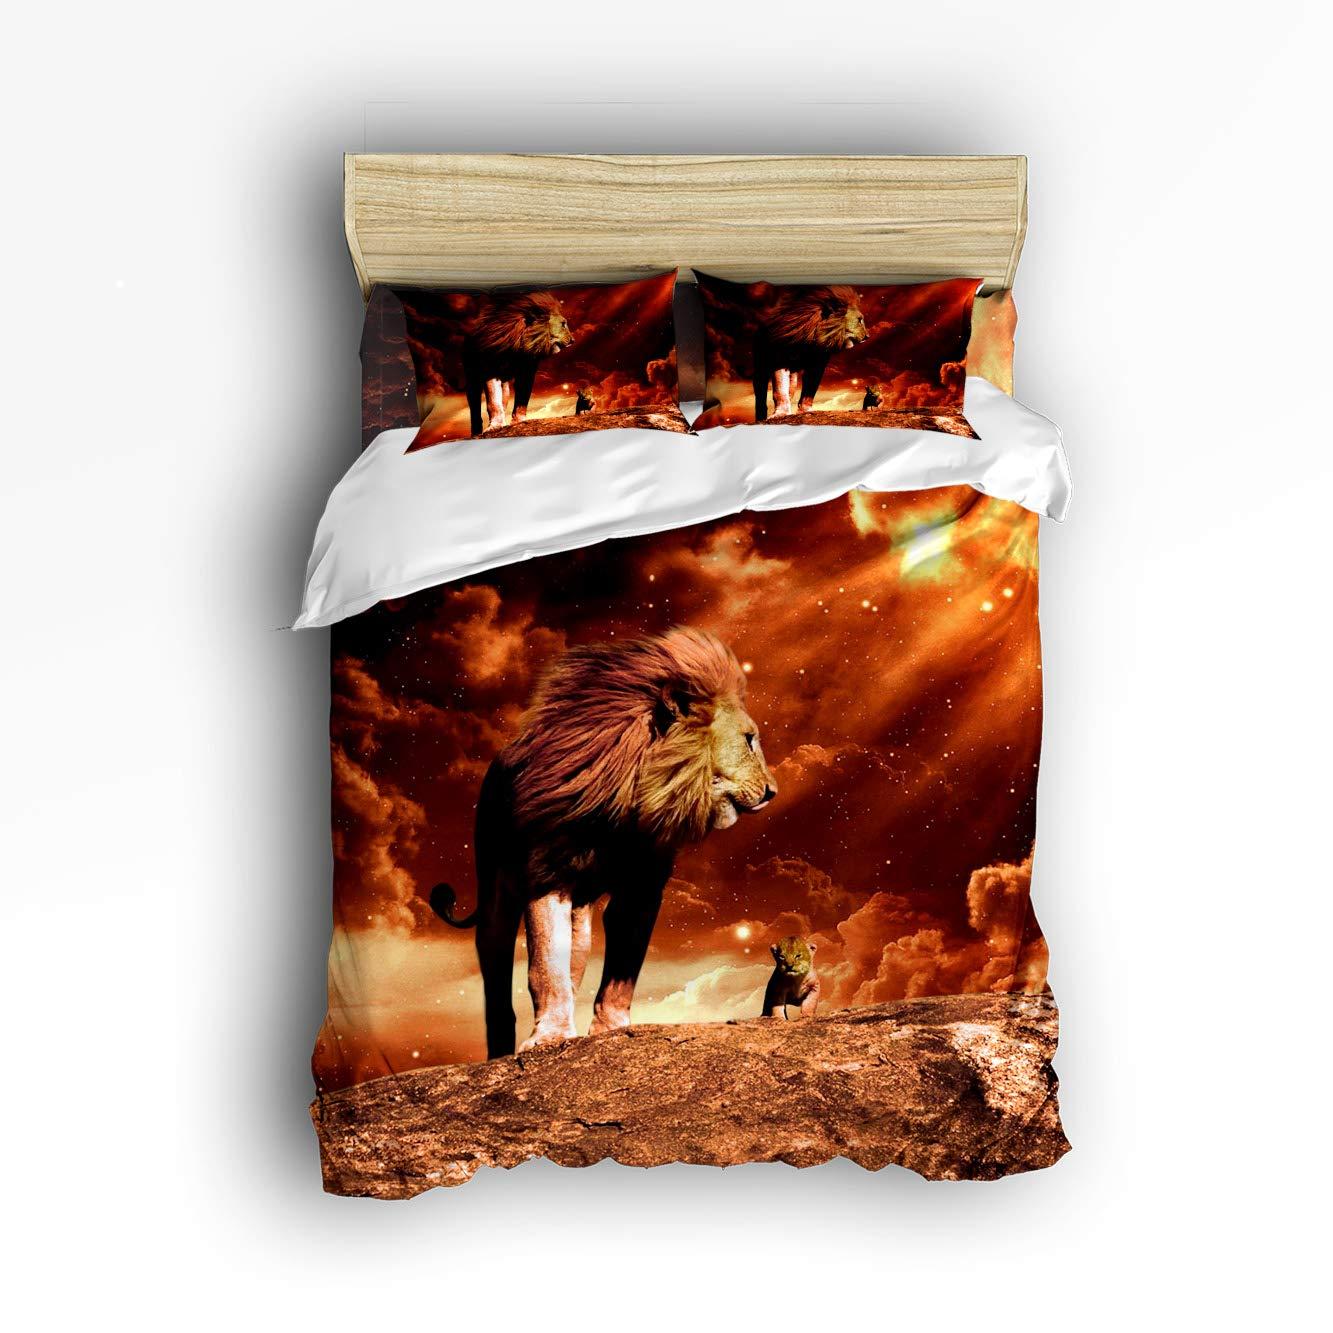 USOPHIA ベッドシーツ4点セット スカルダイヤモンド トゥギャザー 3Dプリント 花柄 羽毛布団カバーセット ツイン 20181009LCZUSOPHIA2SLXM01331SJTAUPA B07JLYX1JH Lion409l ツイン